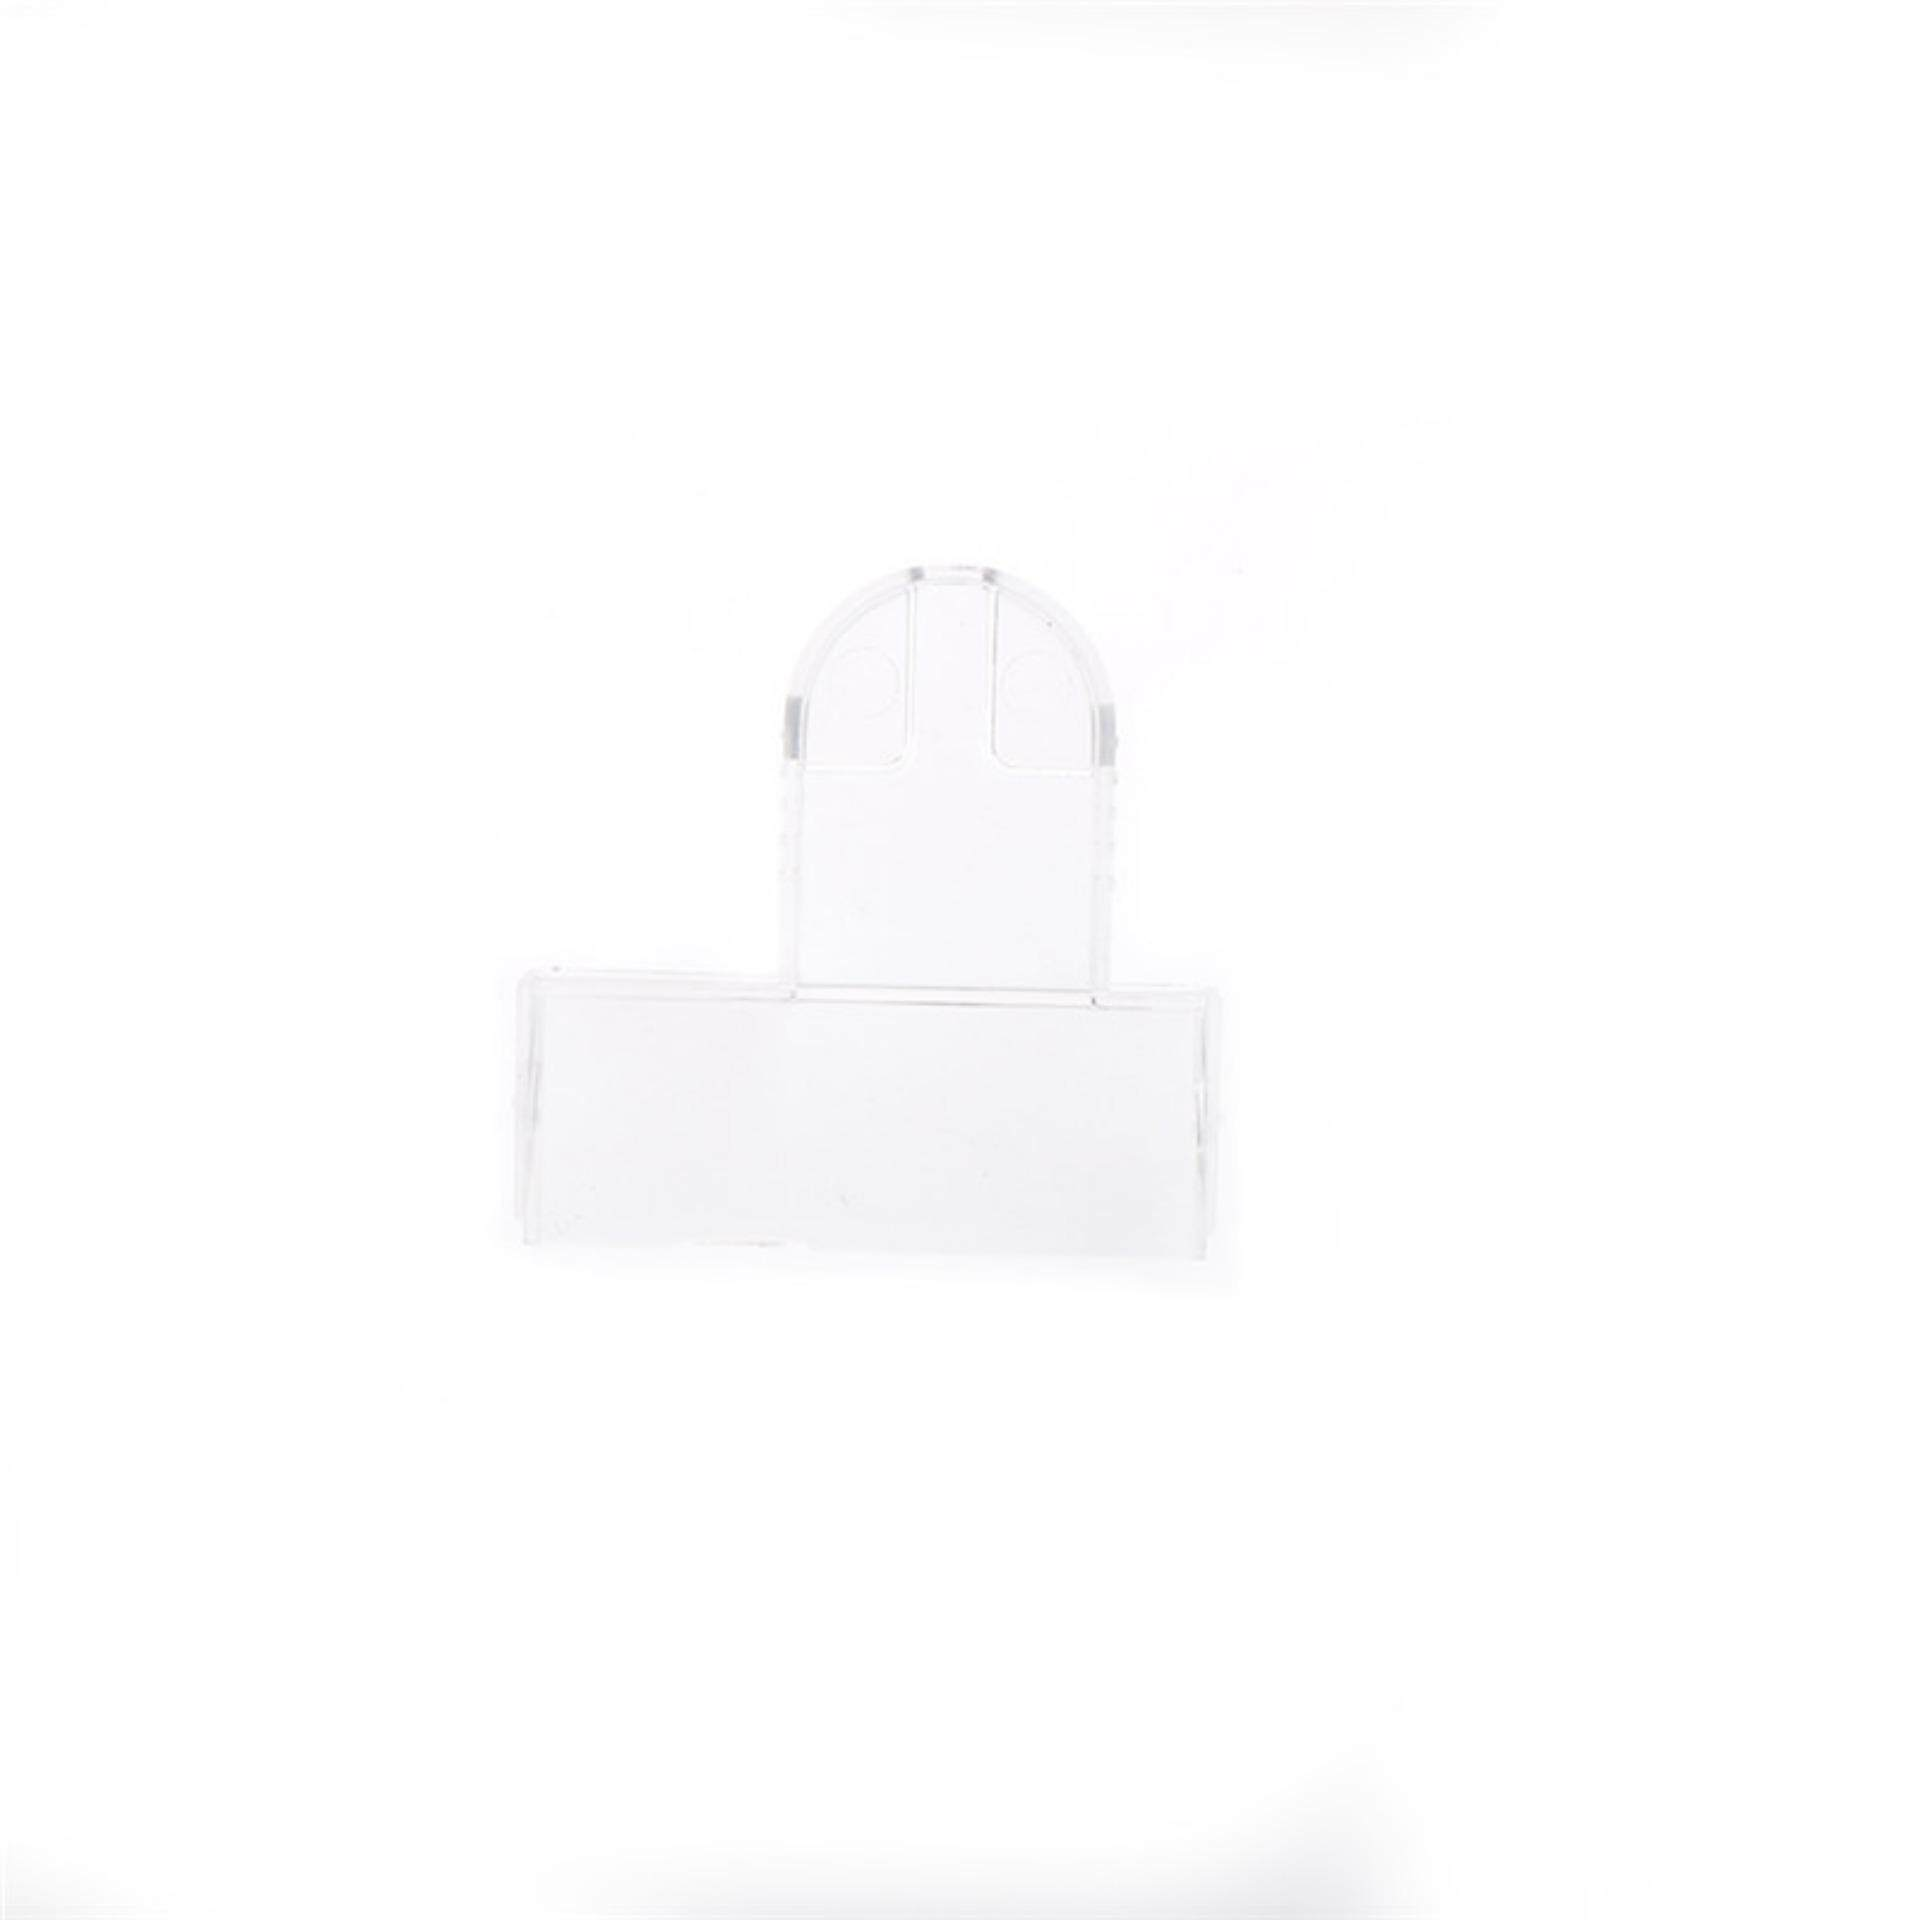 Gimbal Lock Clamp Camera Cover Protector PTZ Holder for DJI Mavic Pro - intl